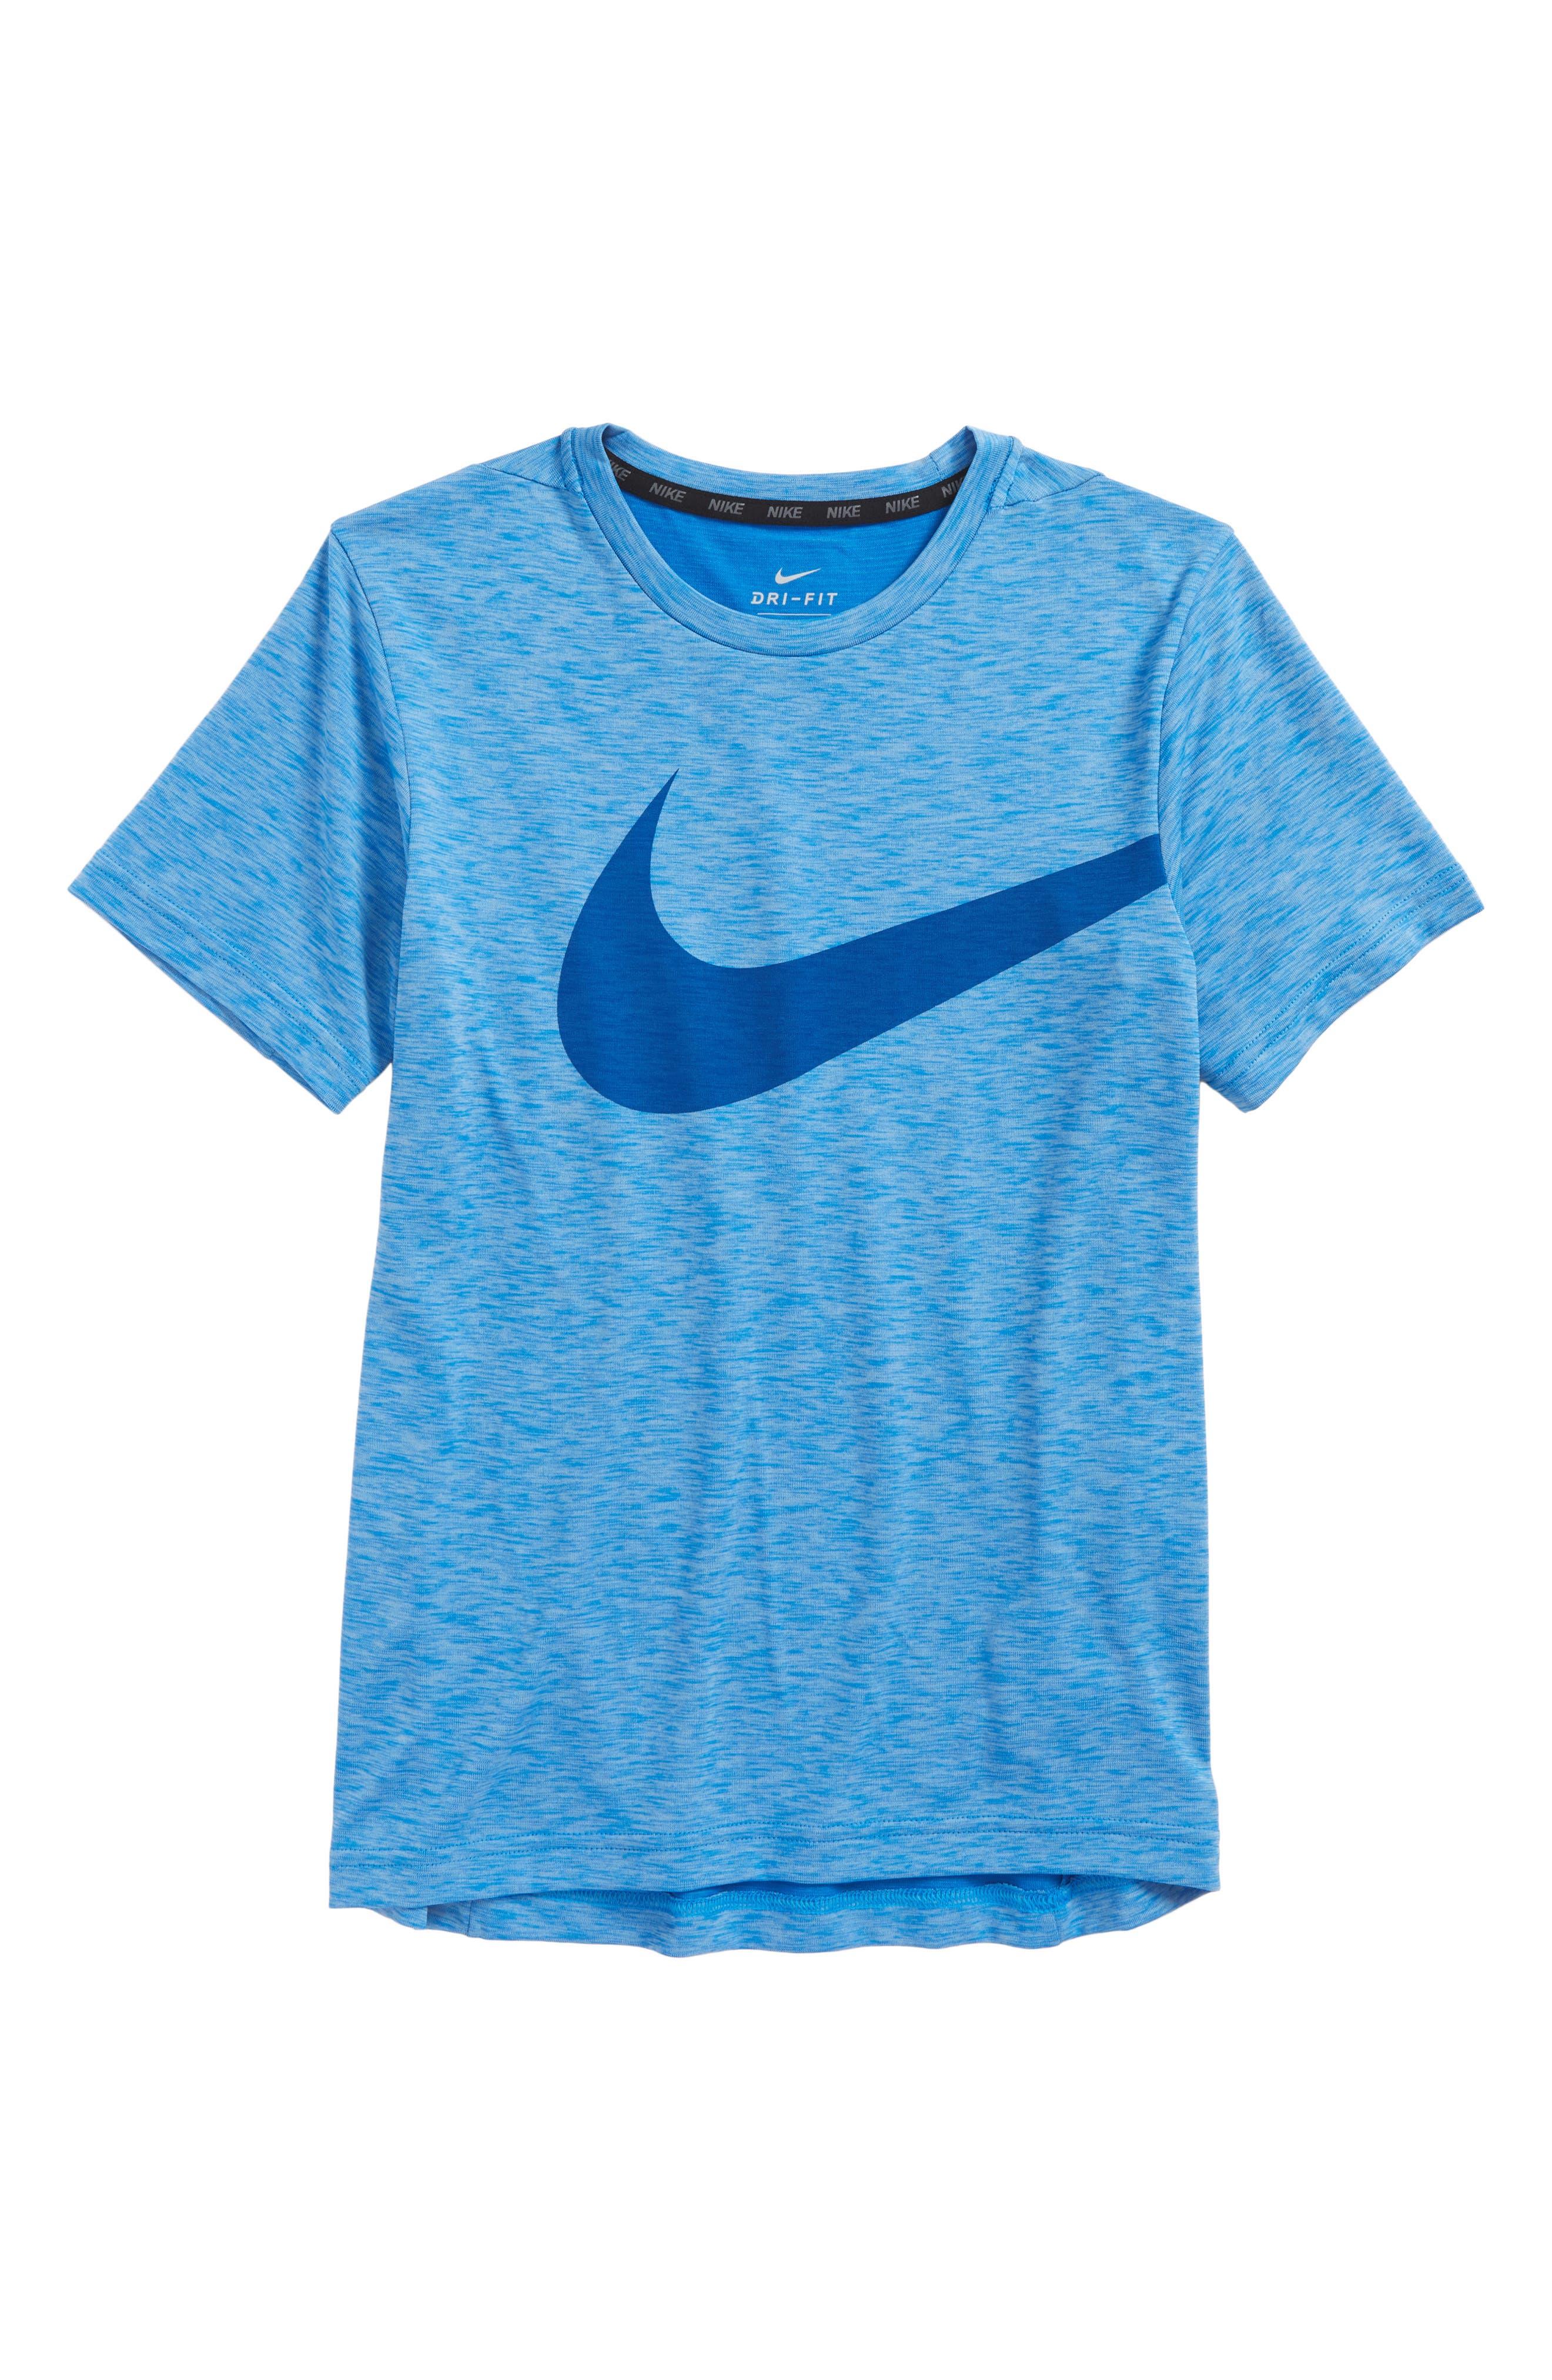 Alternate Image 1 Selected - Nike Breathe Dri-FIT T-Shirt (Little Boys & Big Boys)